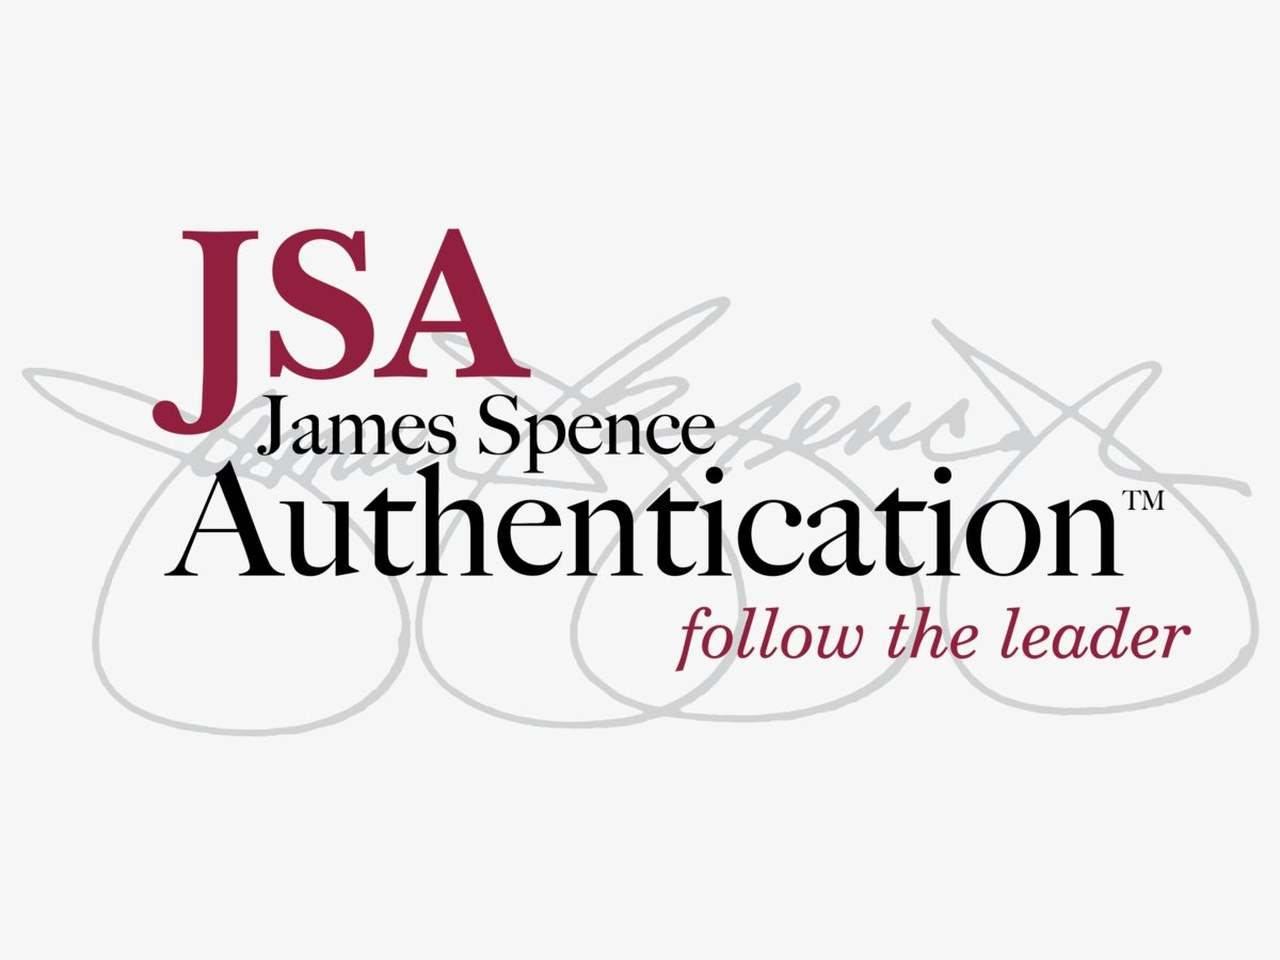 JSA IN-STORE AUTOGRAPH AUTHENTICATION